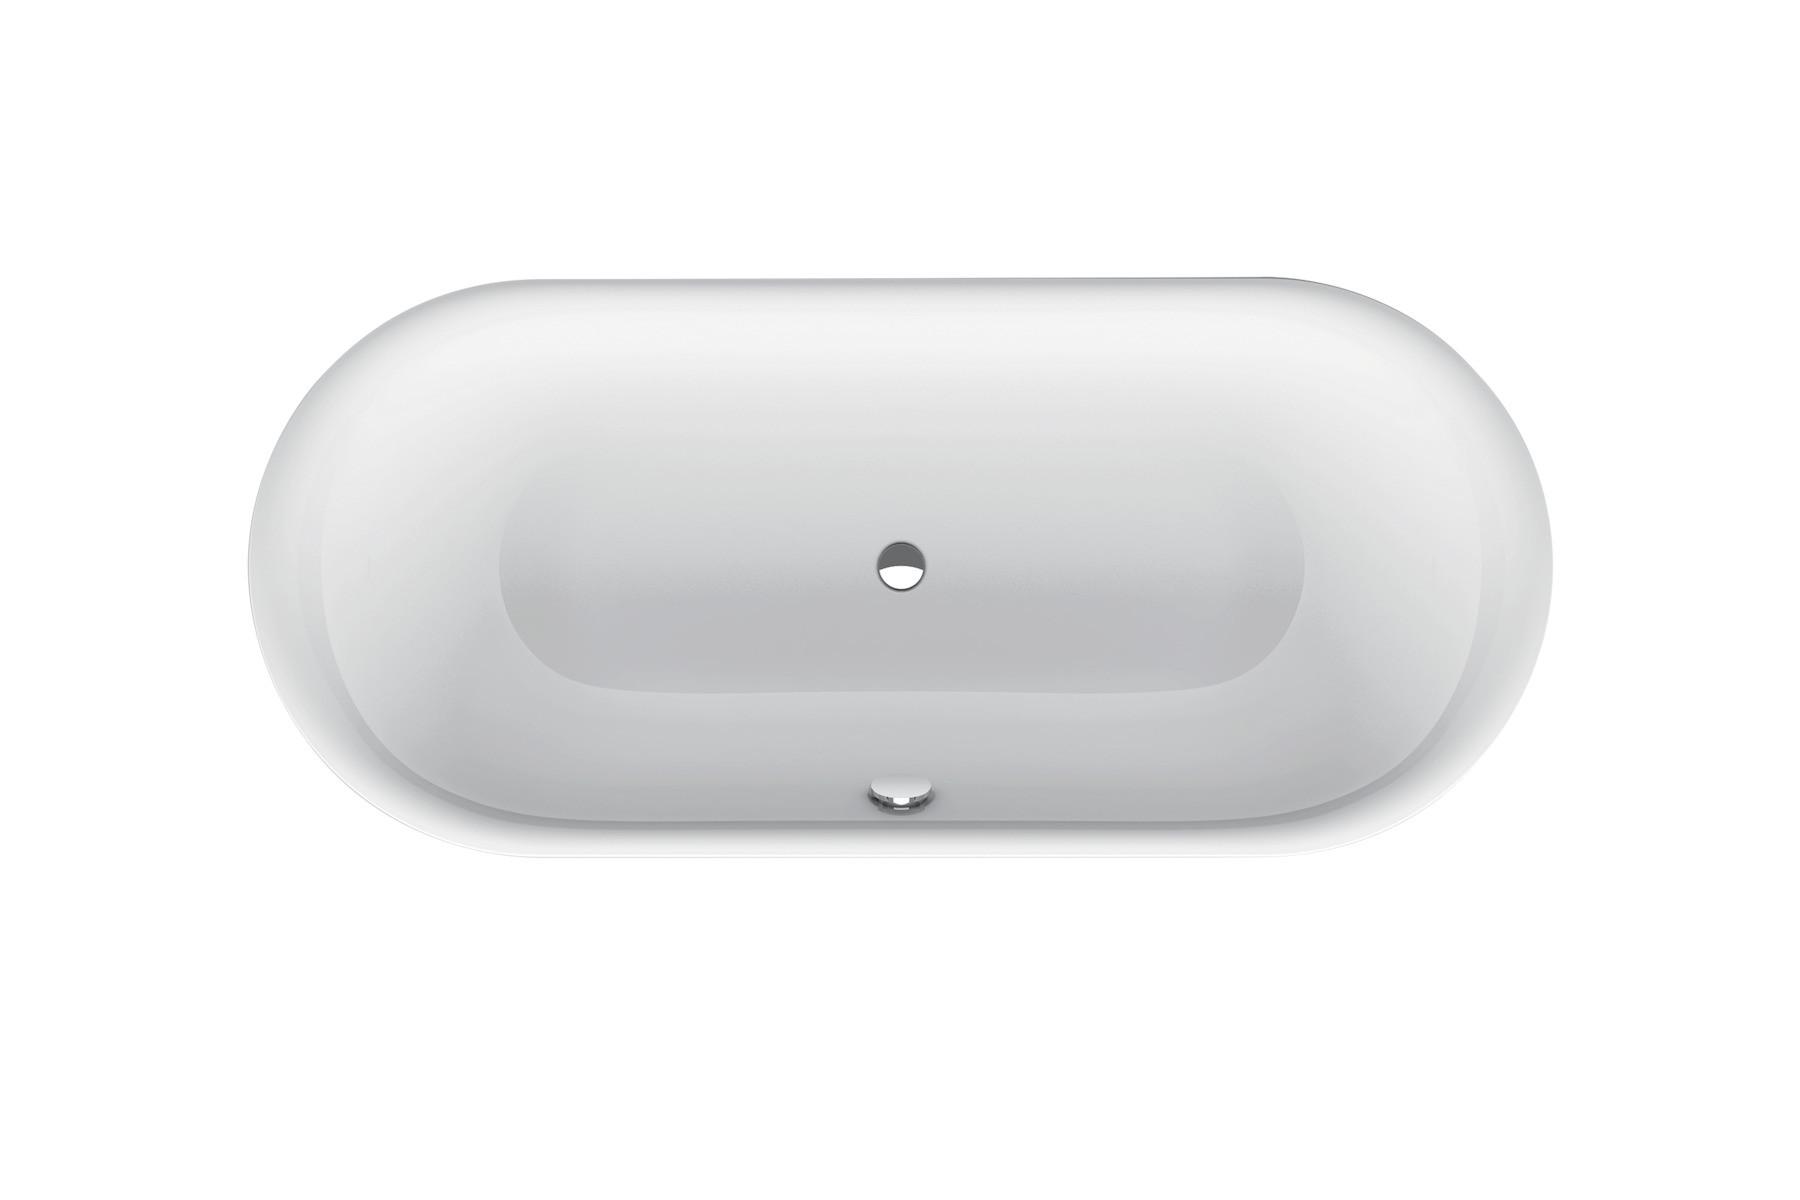 Bette Lux Oval - 1800×800 mm Bahama Beige (003) exkl. Antirutsch inkl. Wannenträger